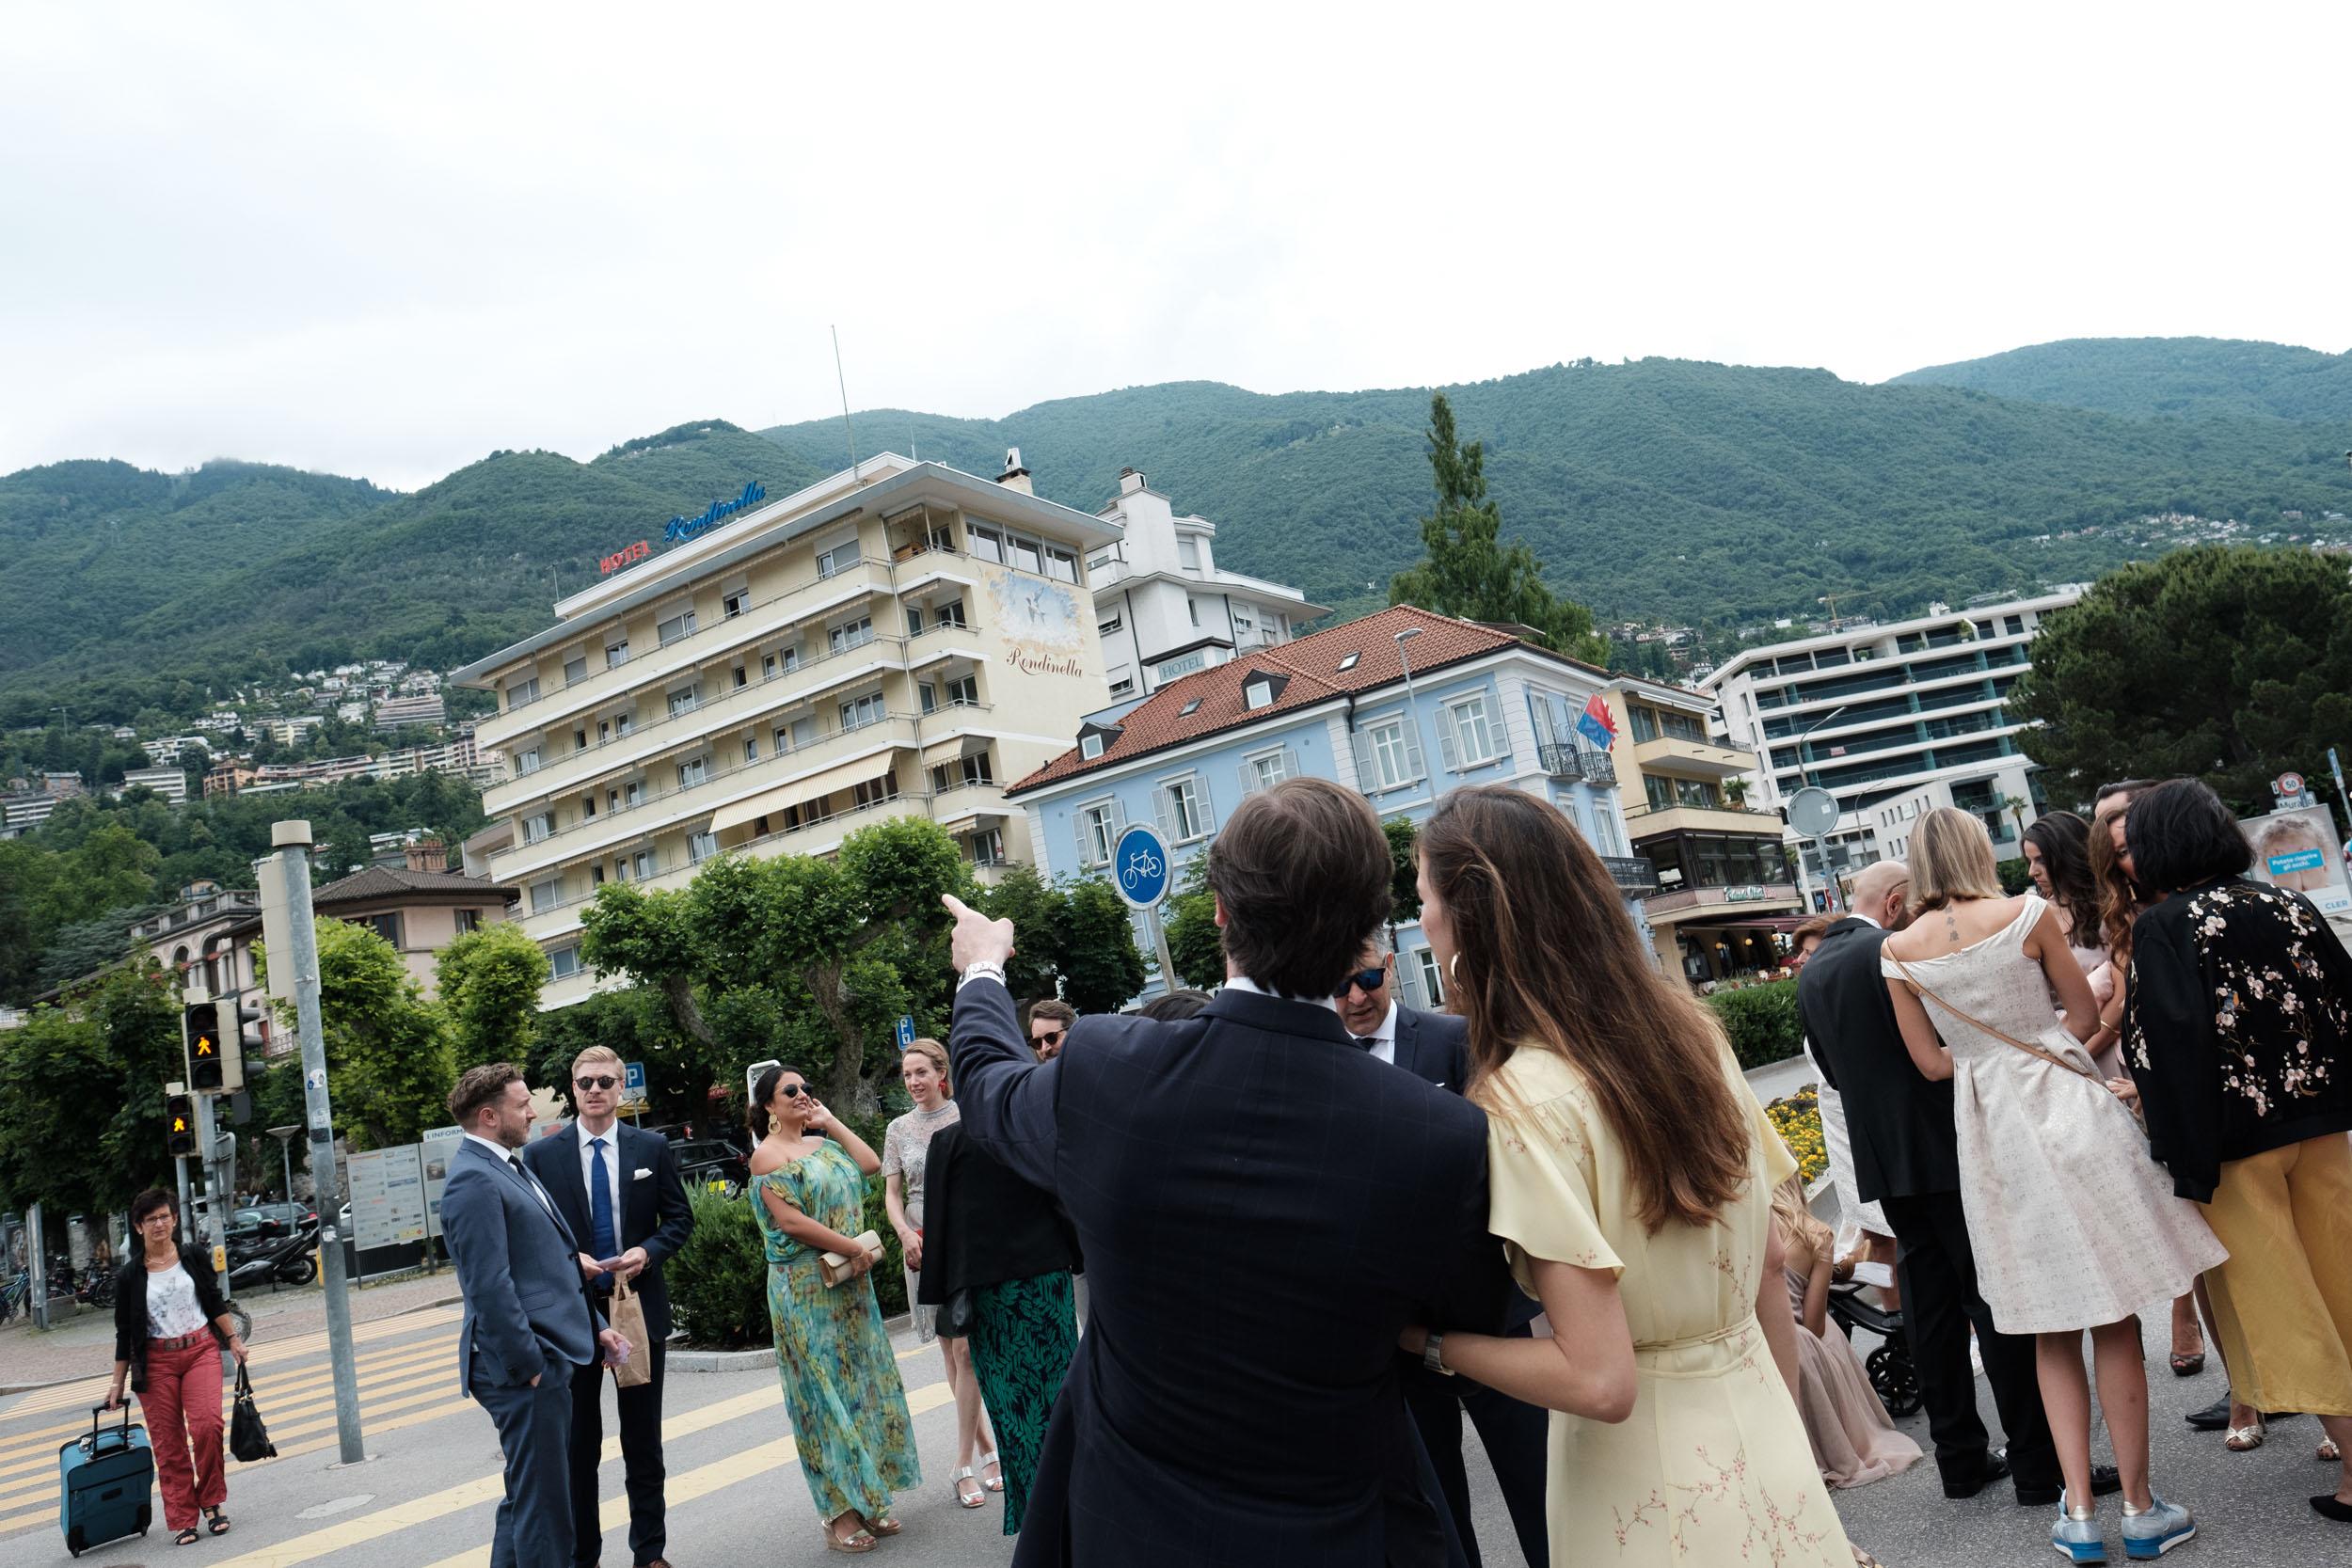 olivia-andreas-wedding-switzerland-128.jpg